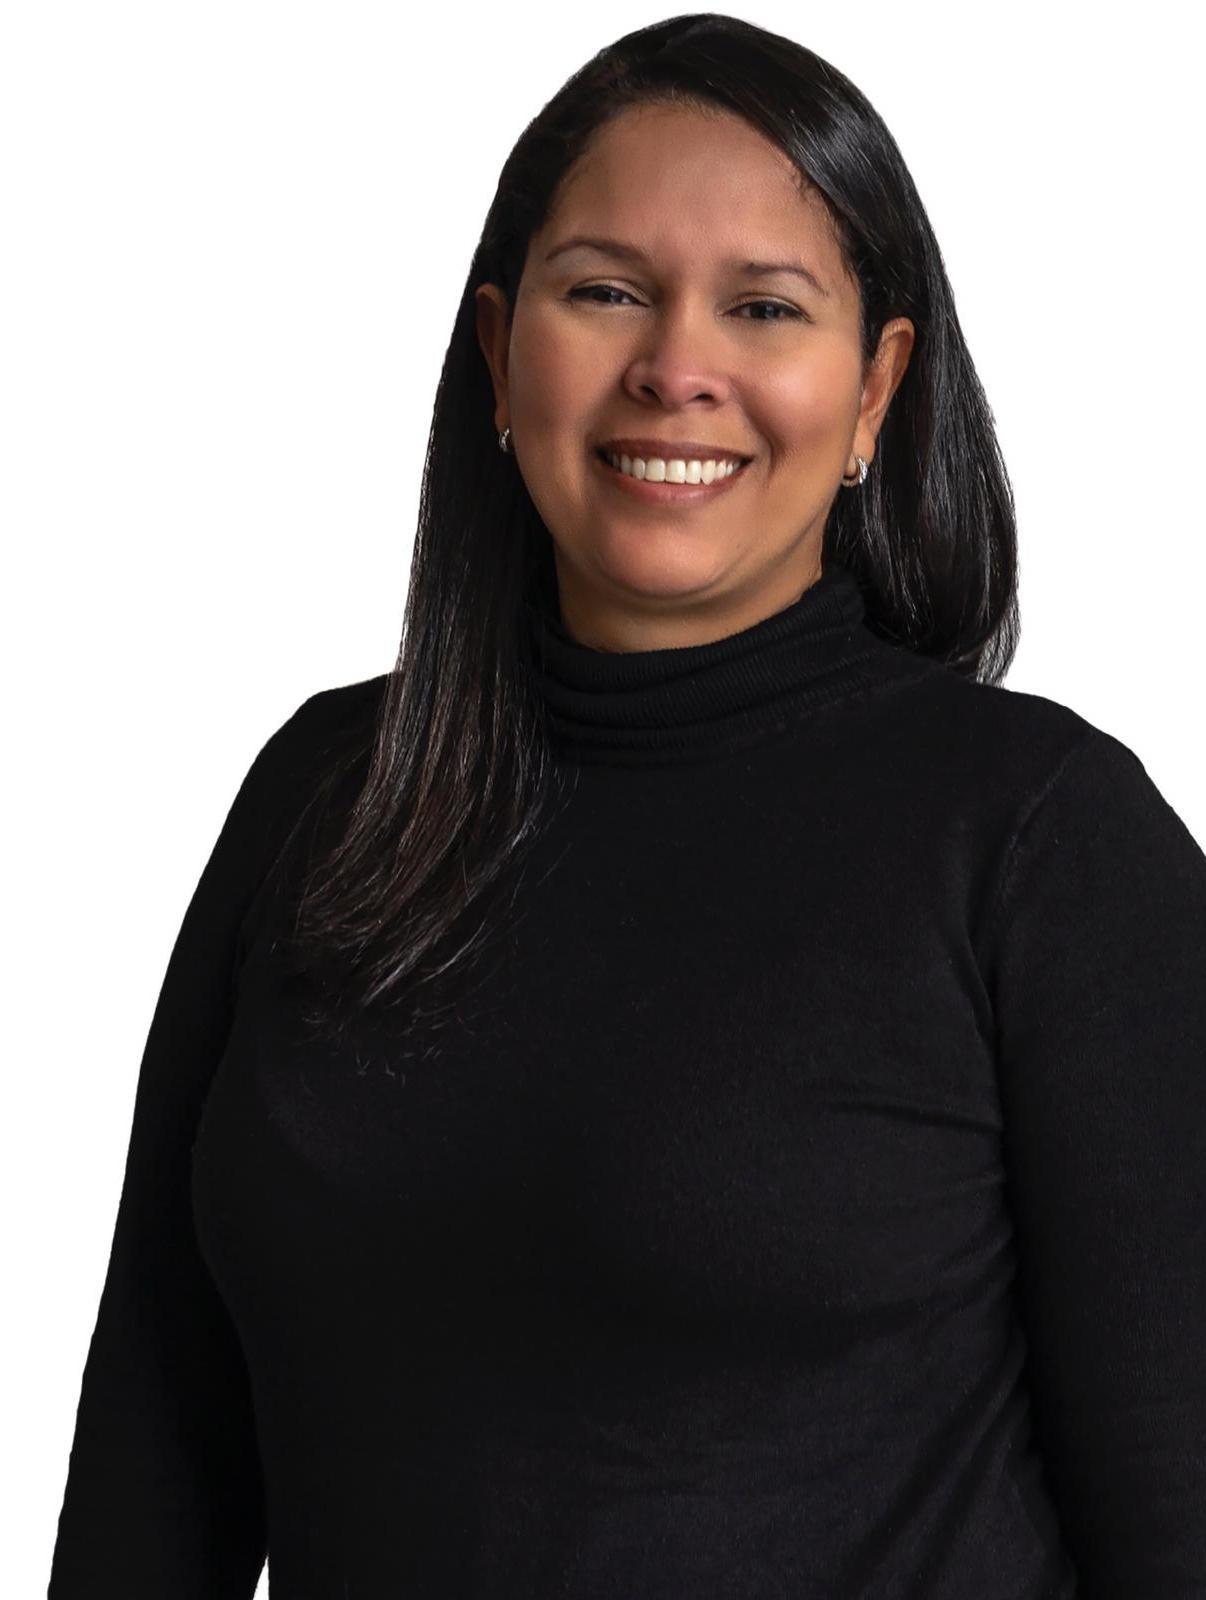 Janeth Salmeron Pacheco